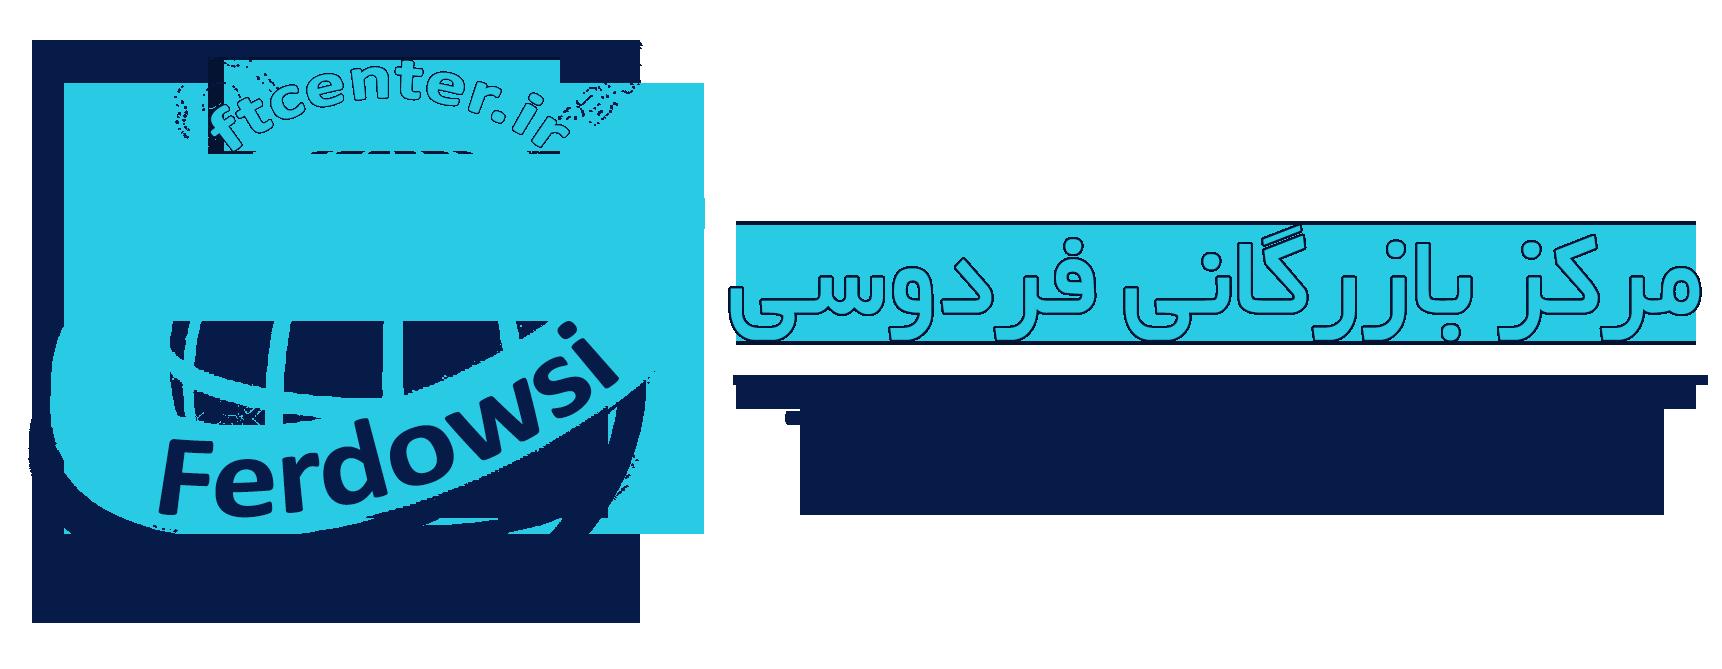 Ferdowsi Trading Center